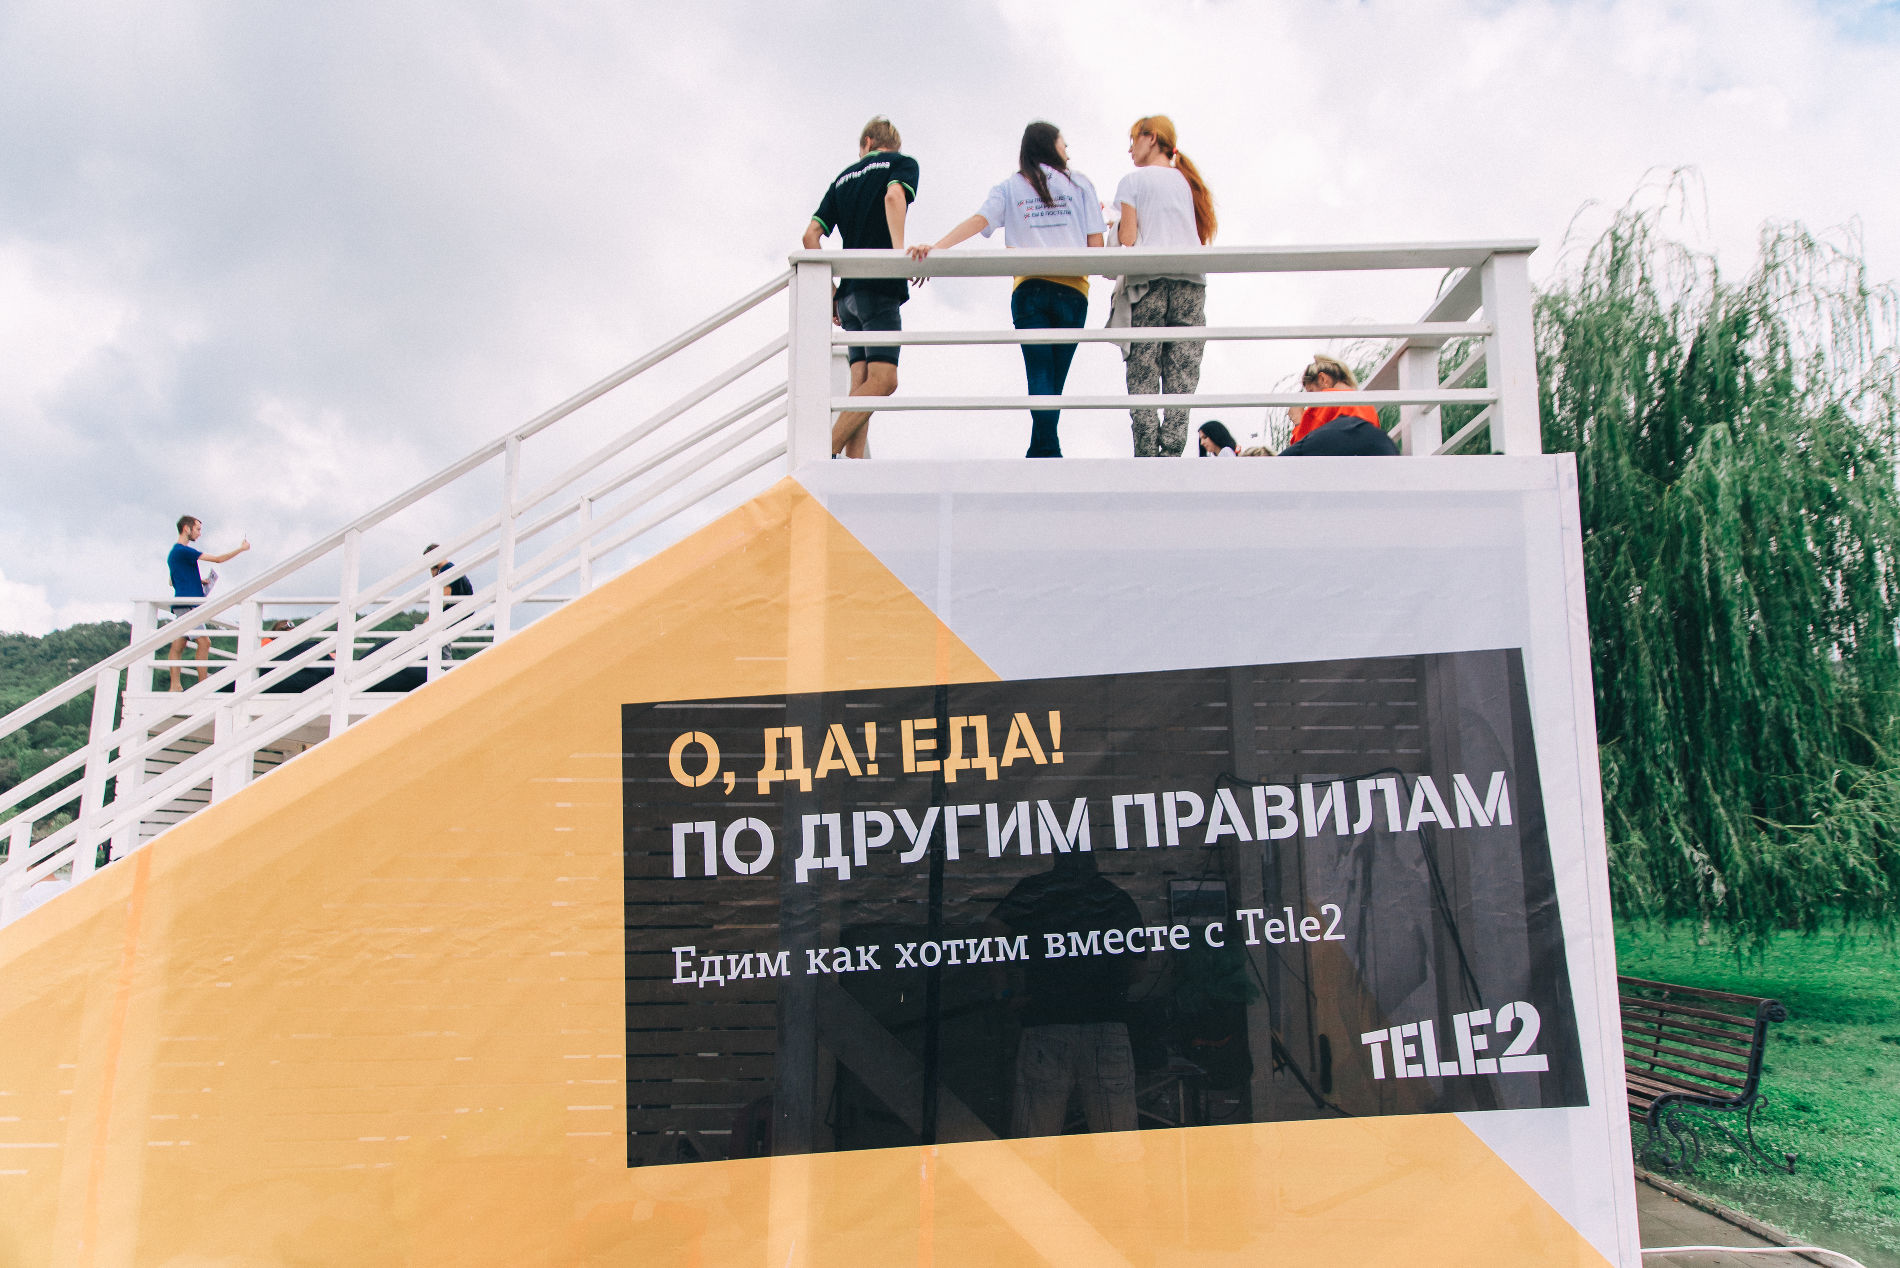 ©Фото пресс-службы Tele2